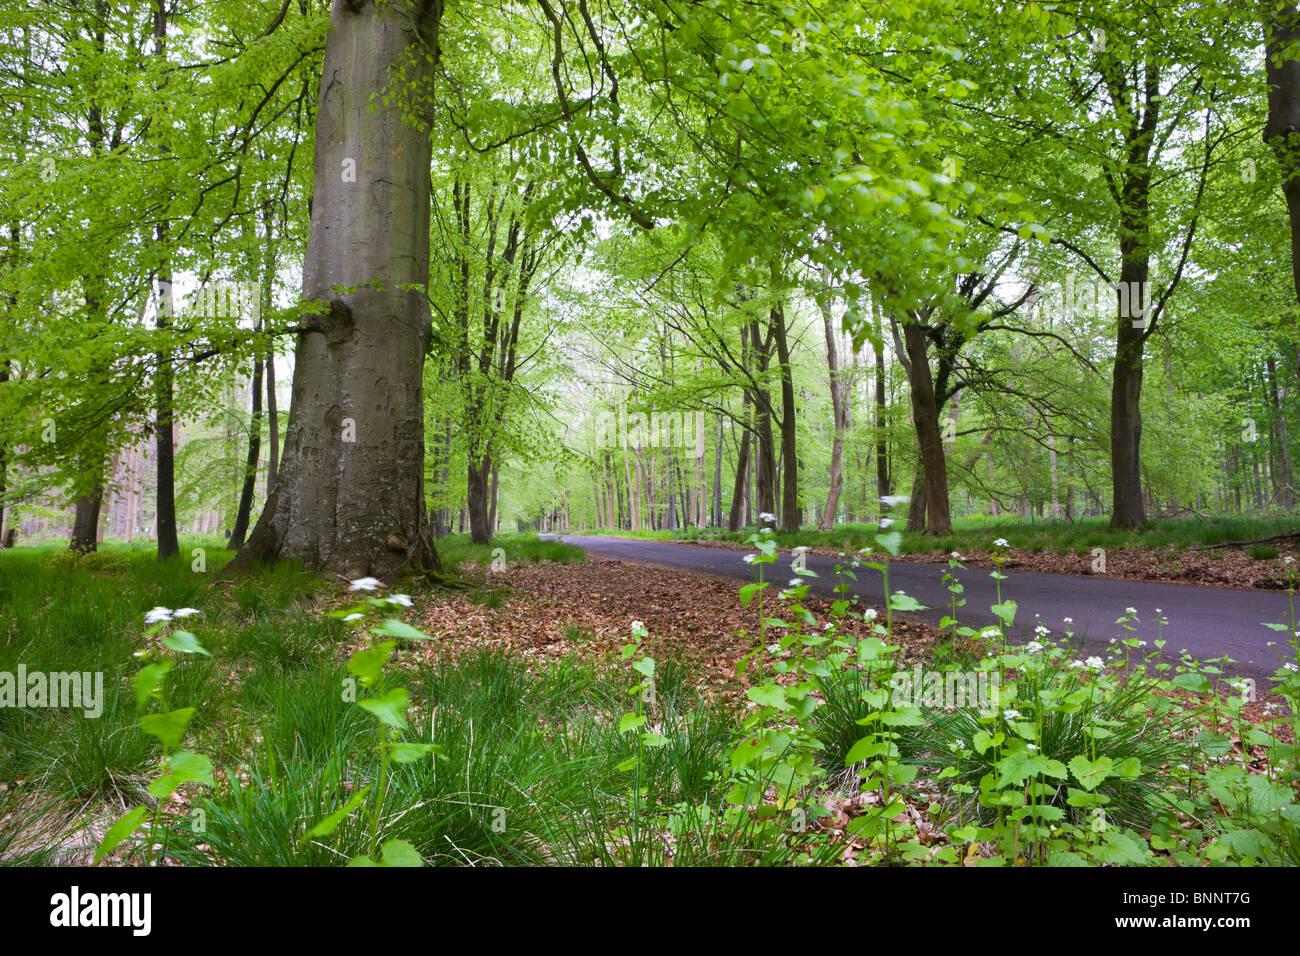 Verdant Spring foliage around the Grand Avenue of Savernake Forest, Marlborough, Wiltshire, England. Spring (May) - Stock Image